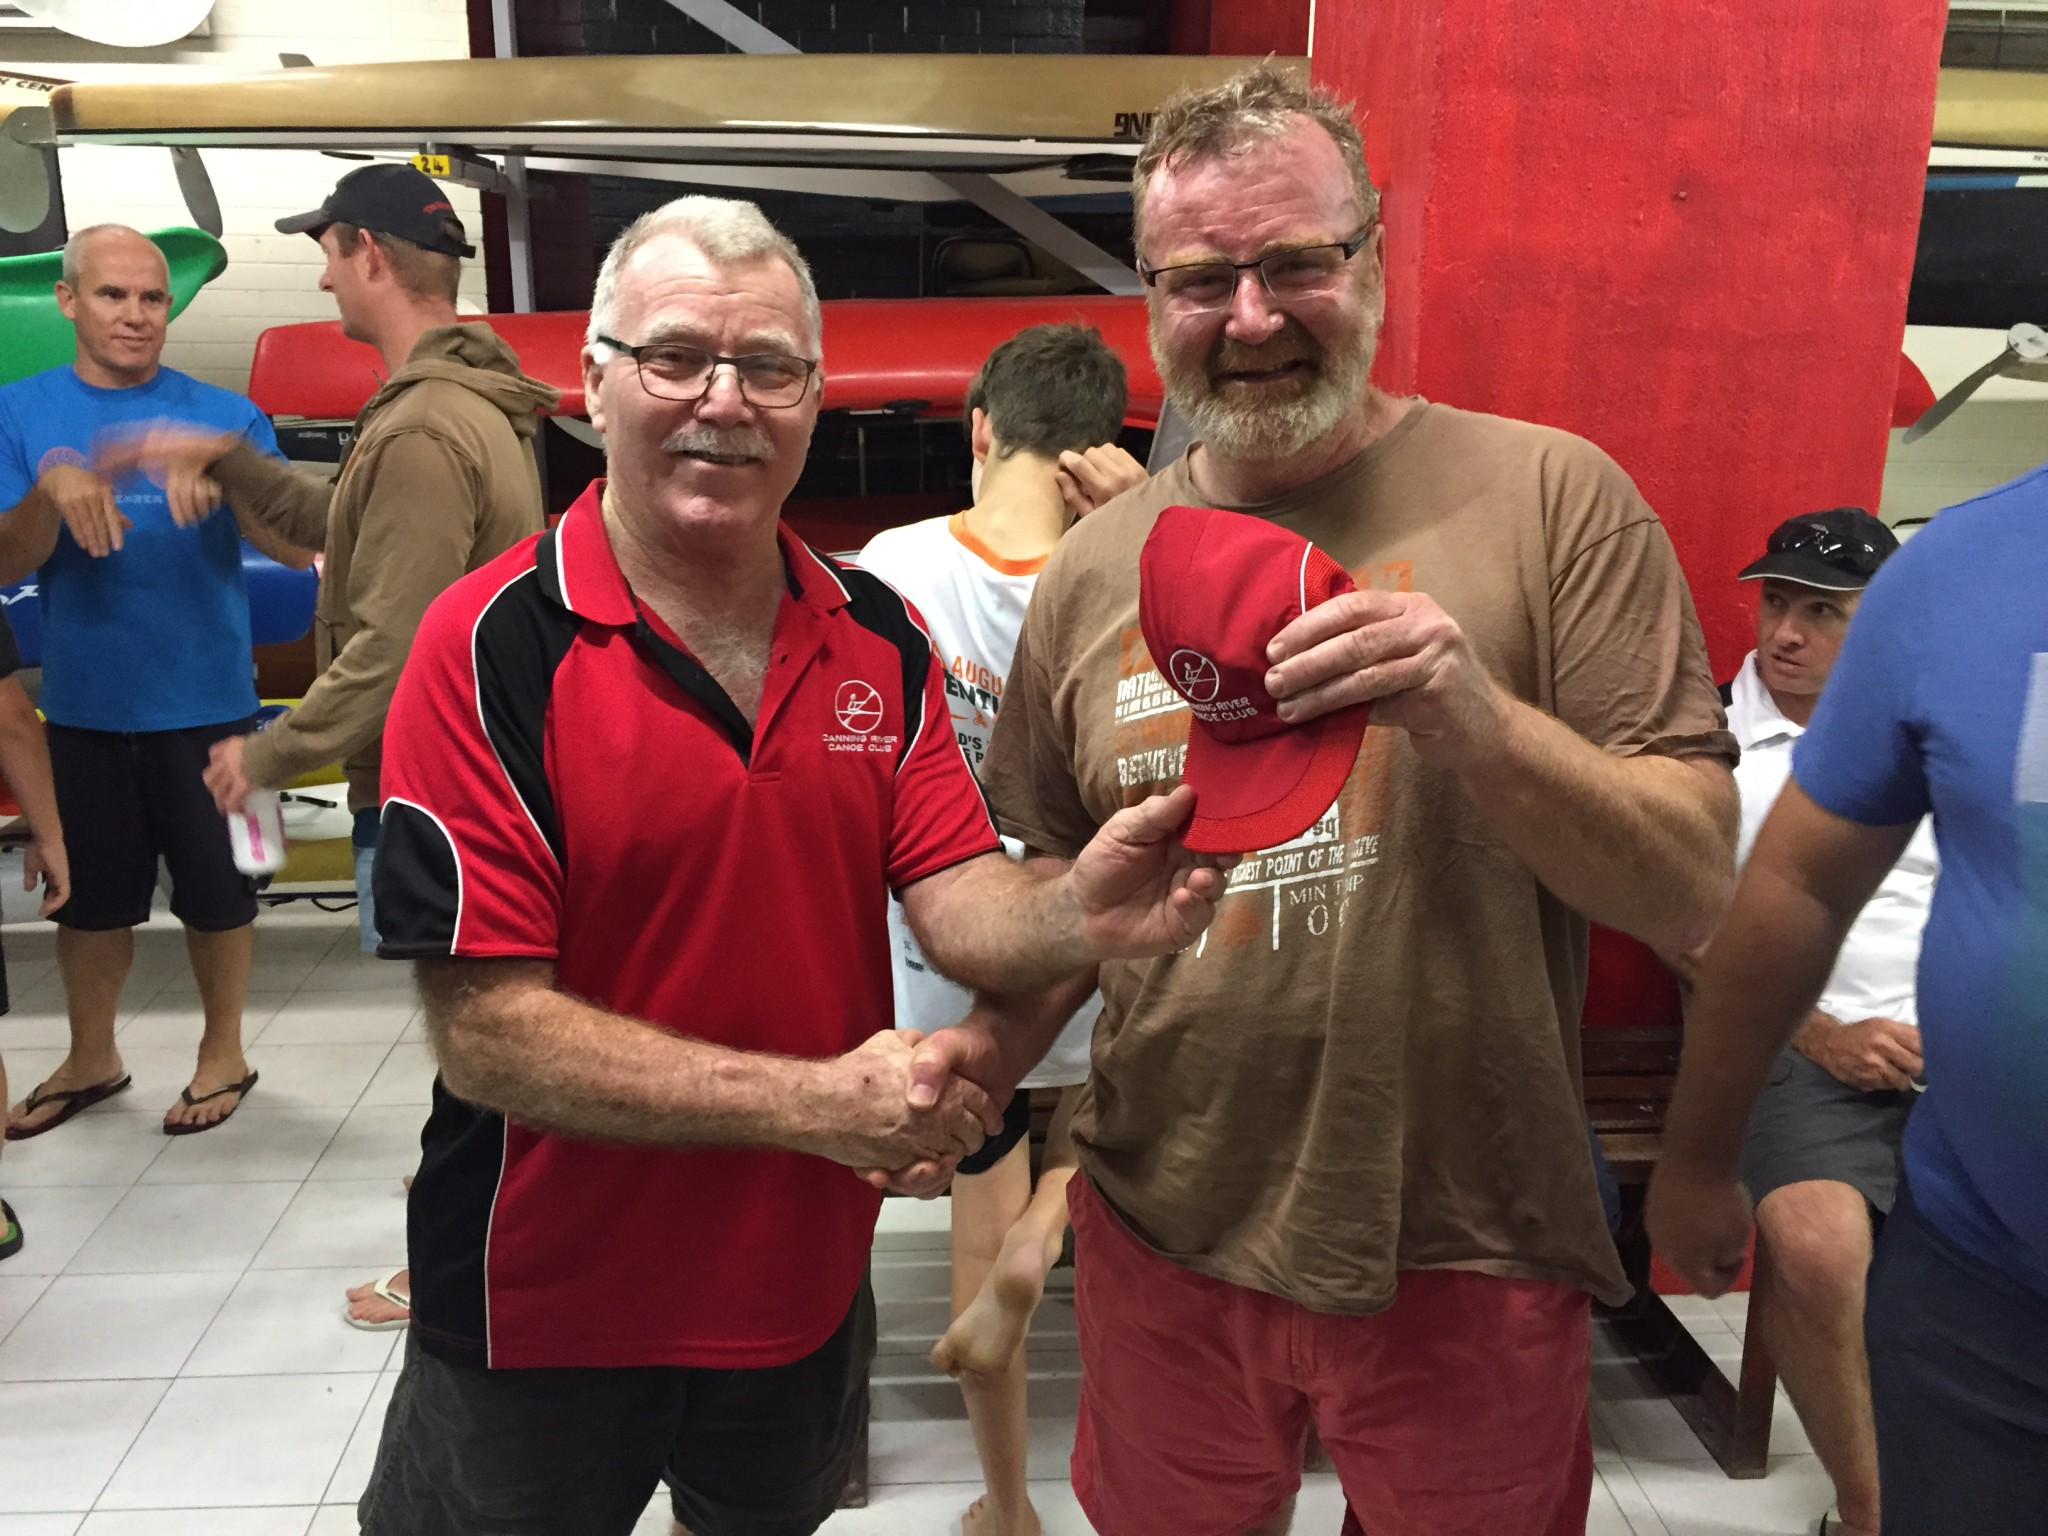 Tuesday 24th November club member David Gardiner presenting Robin with a Canning River Canoe Club cap.